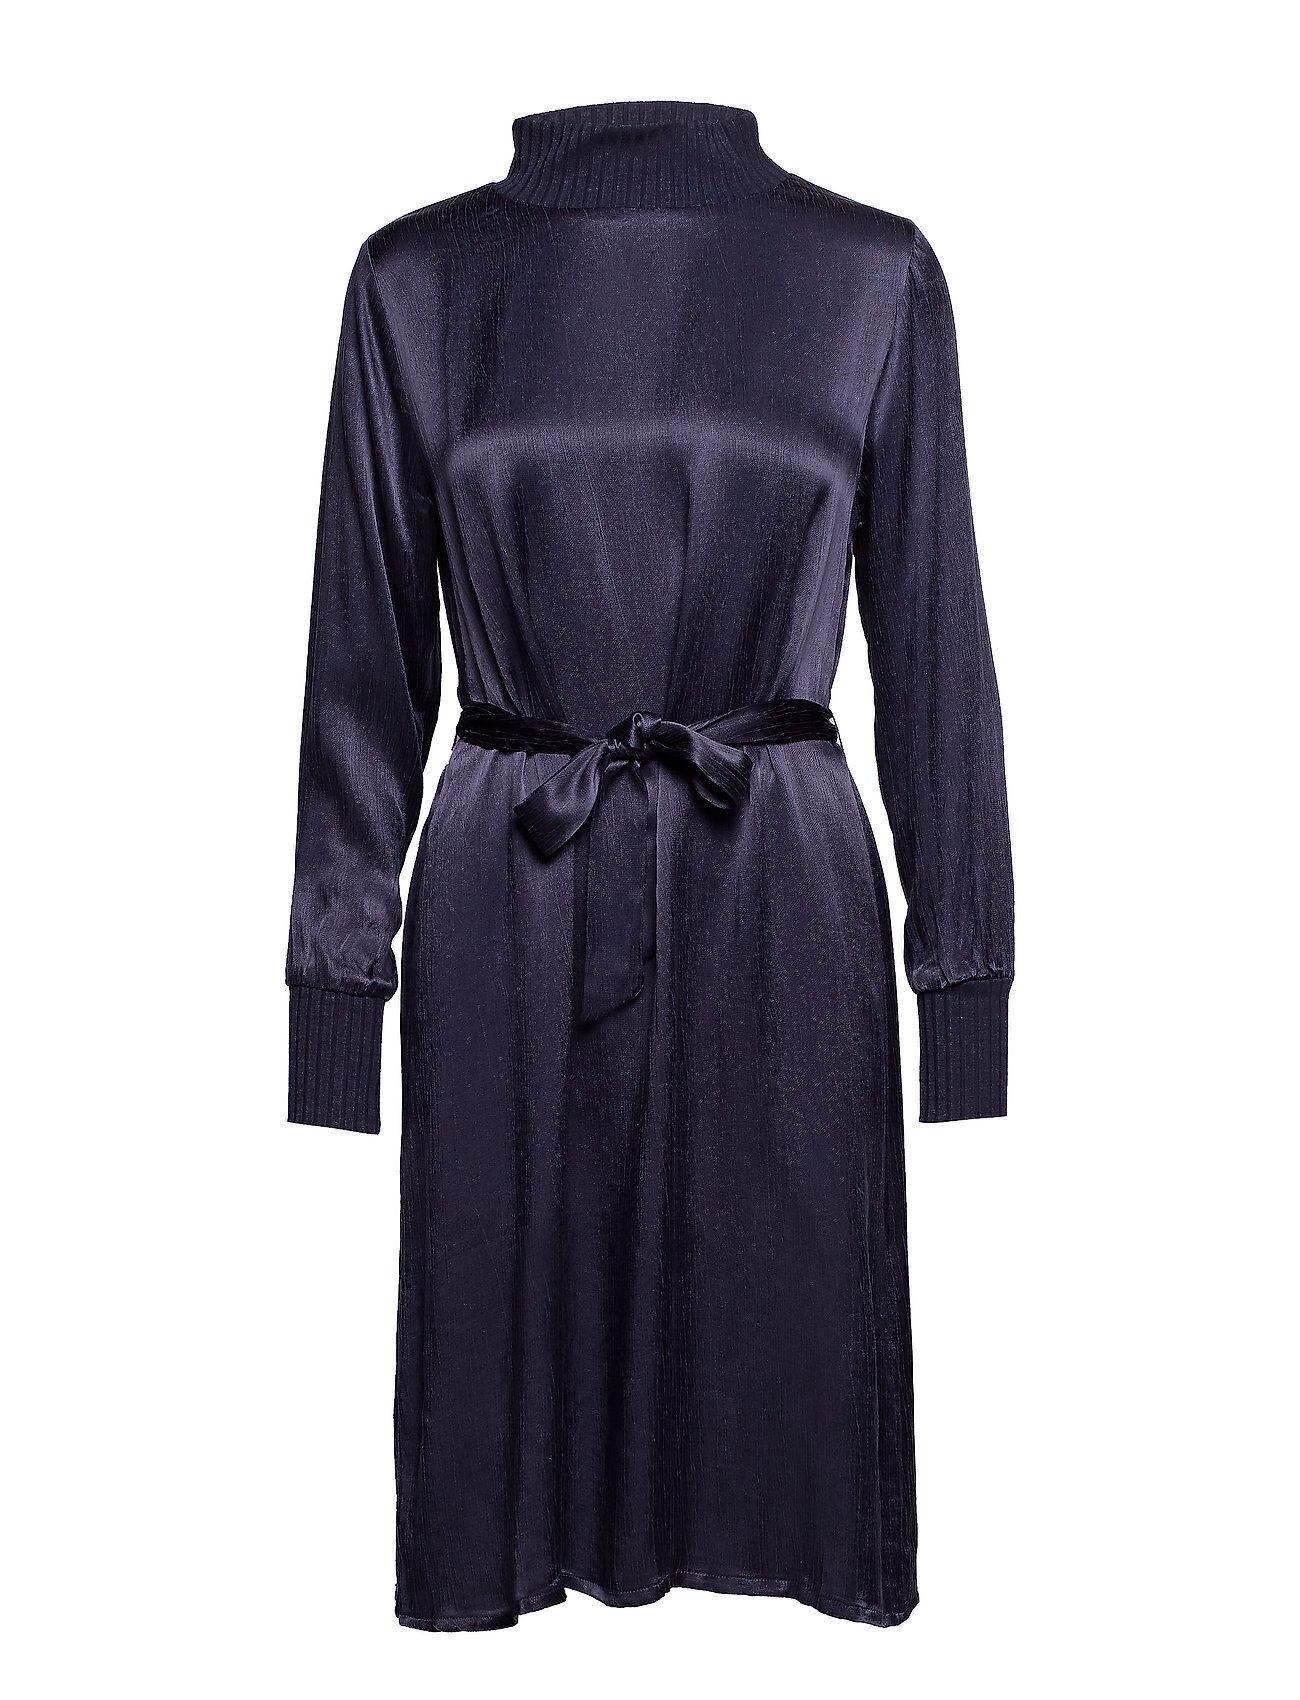 Minus Dixie Dress